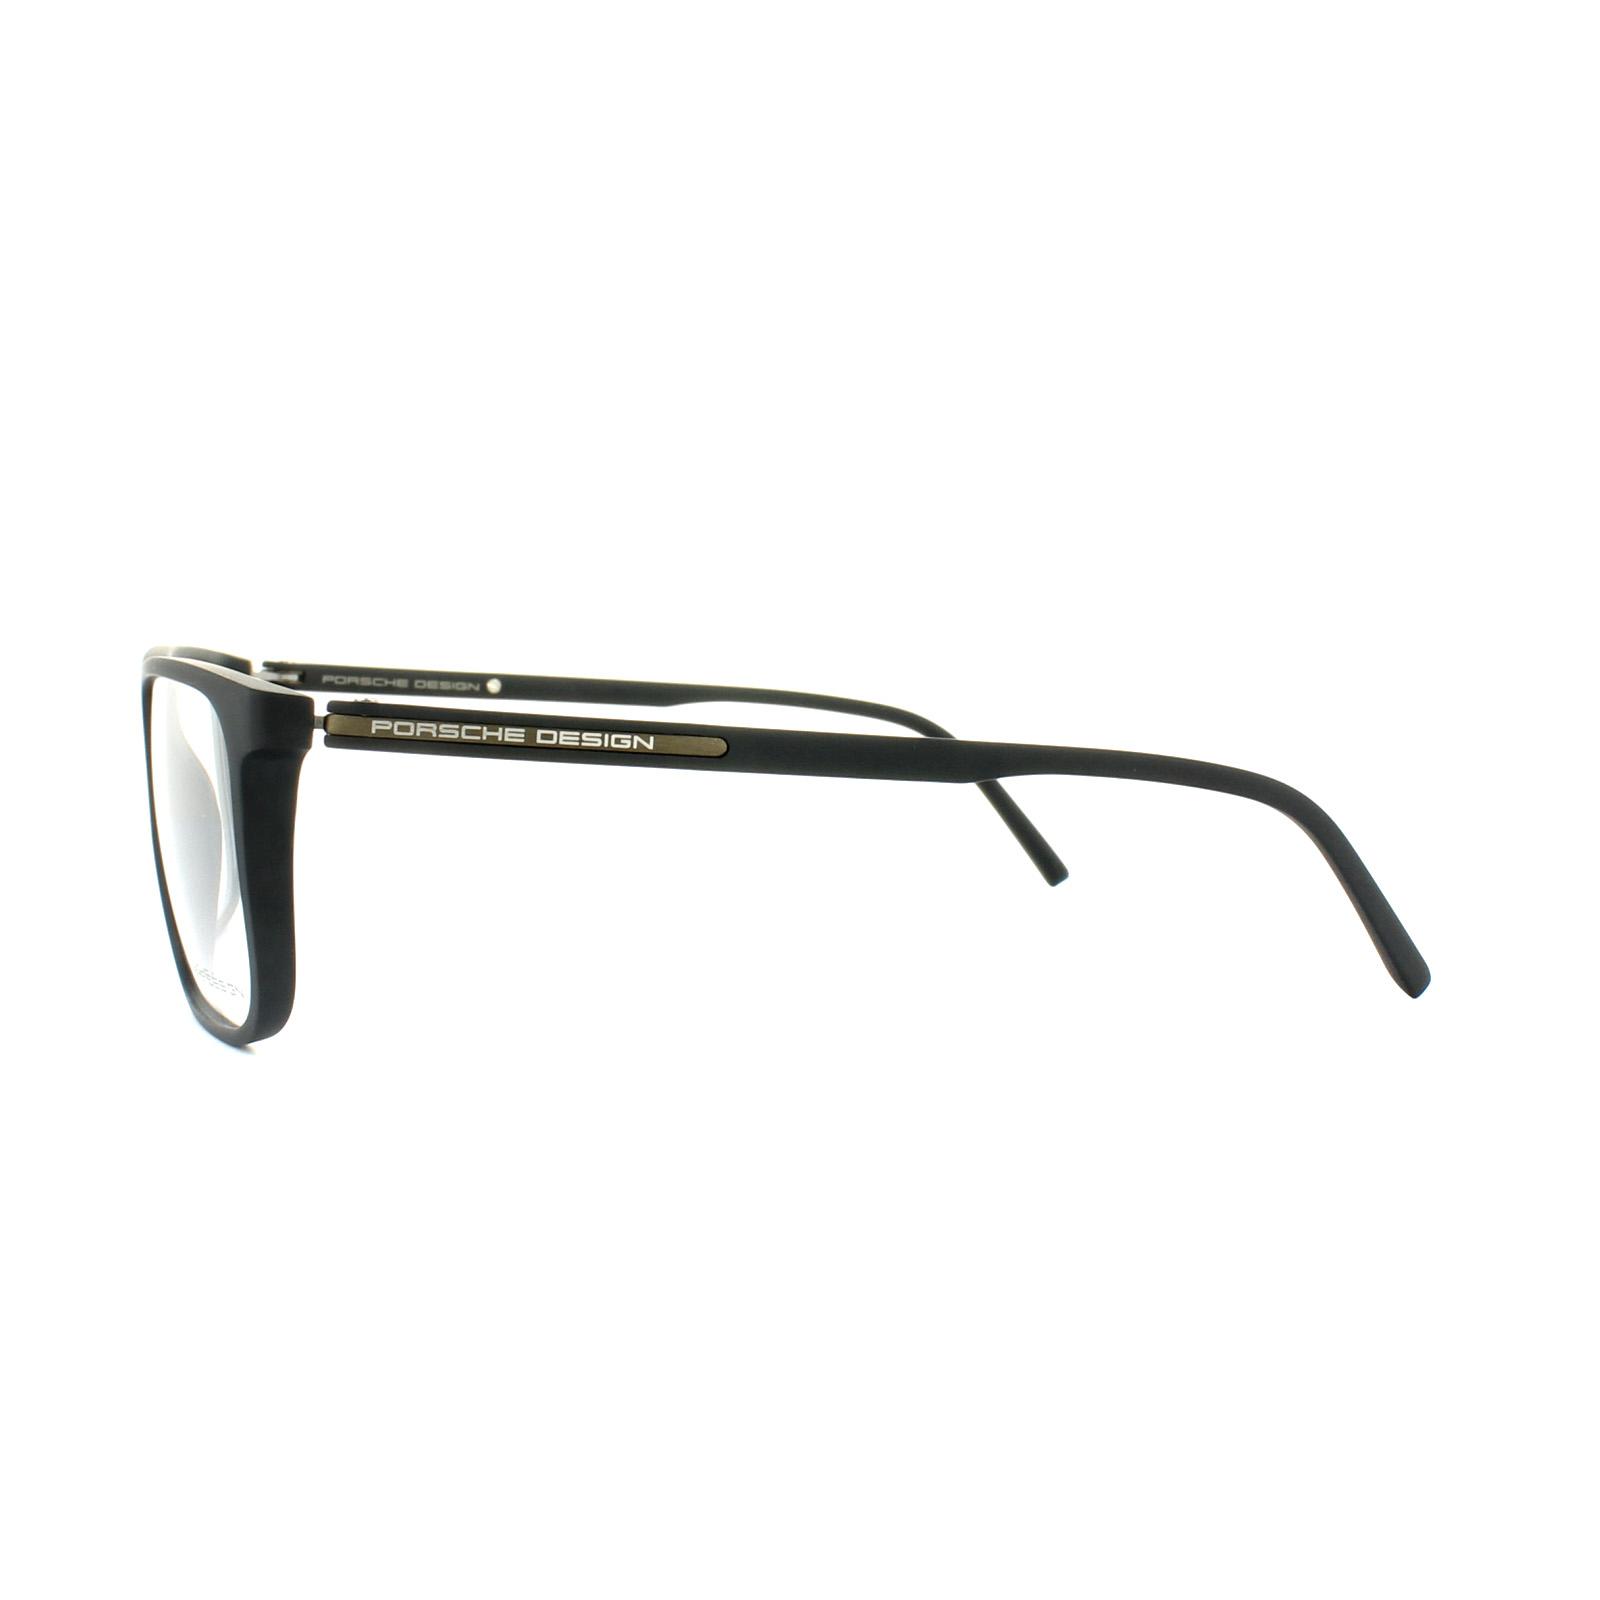 48e7690ad7 Porsche Design Glasses Frames P8299 A Black Clear 4046901294045